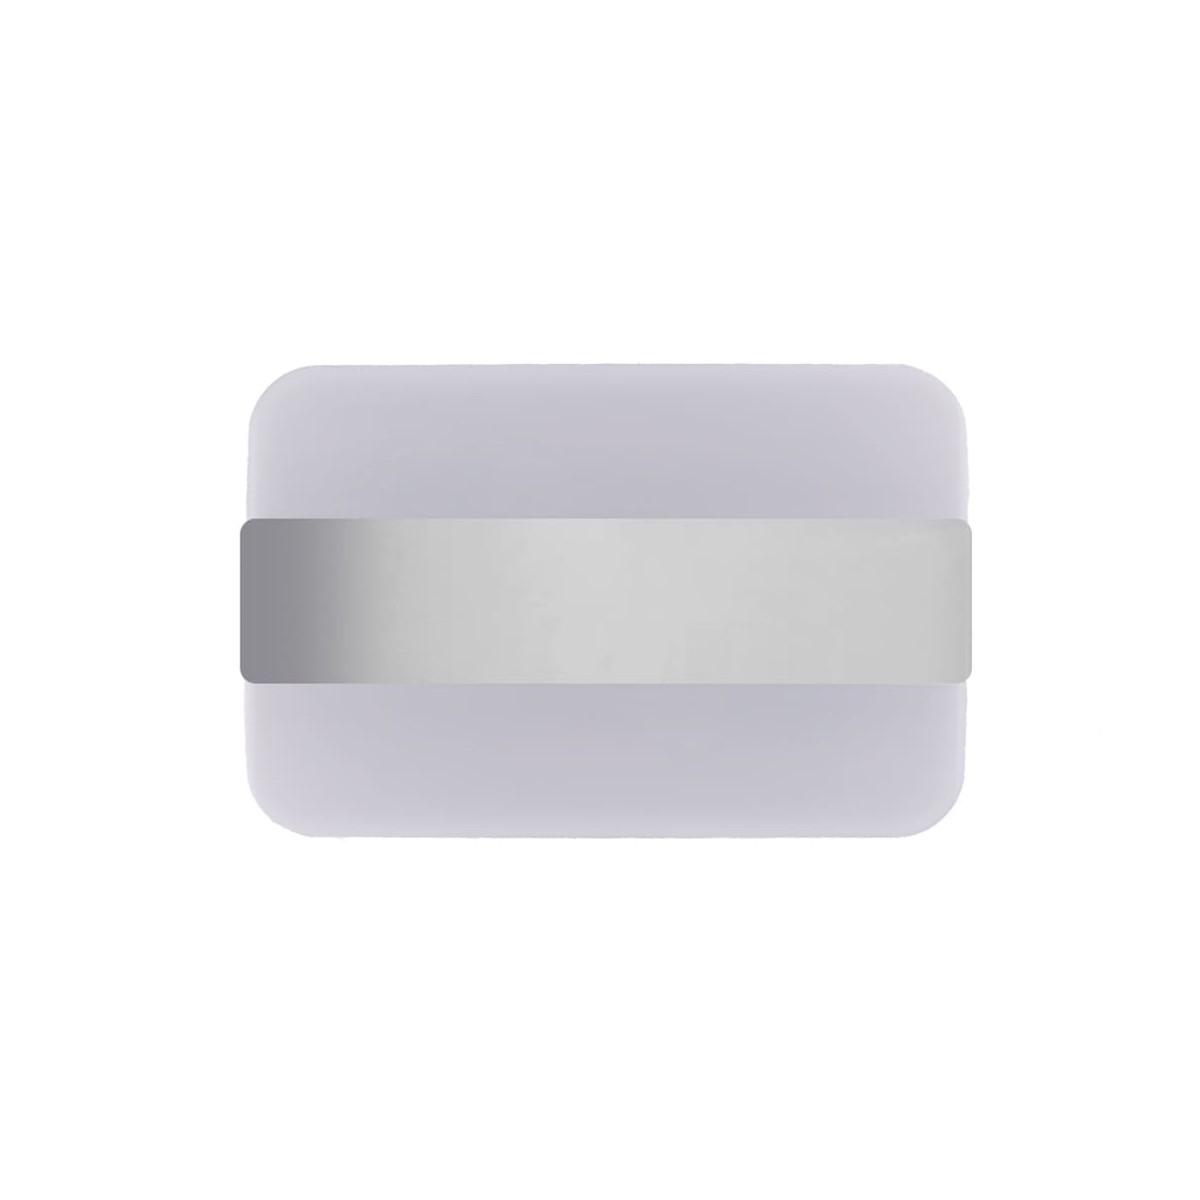 Aplique de baño LED 11W 5700K Álava